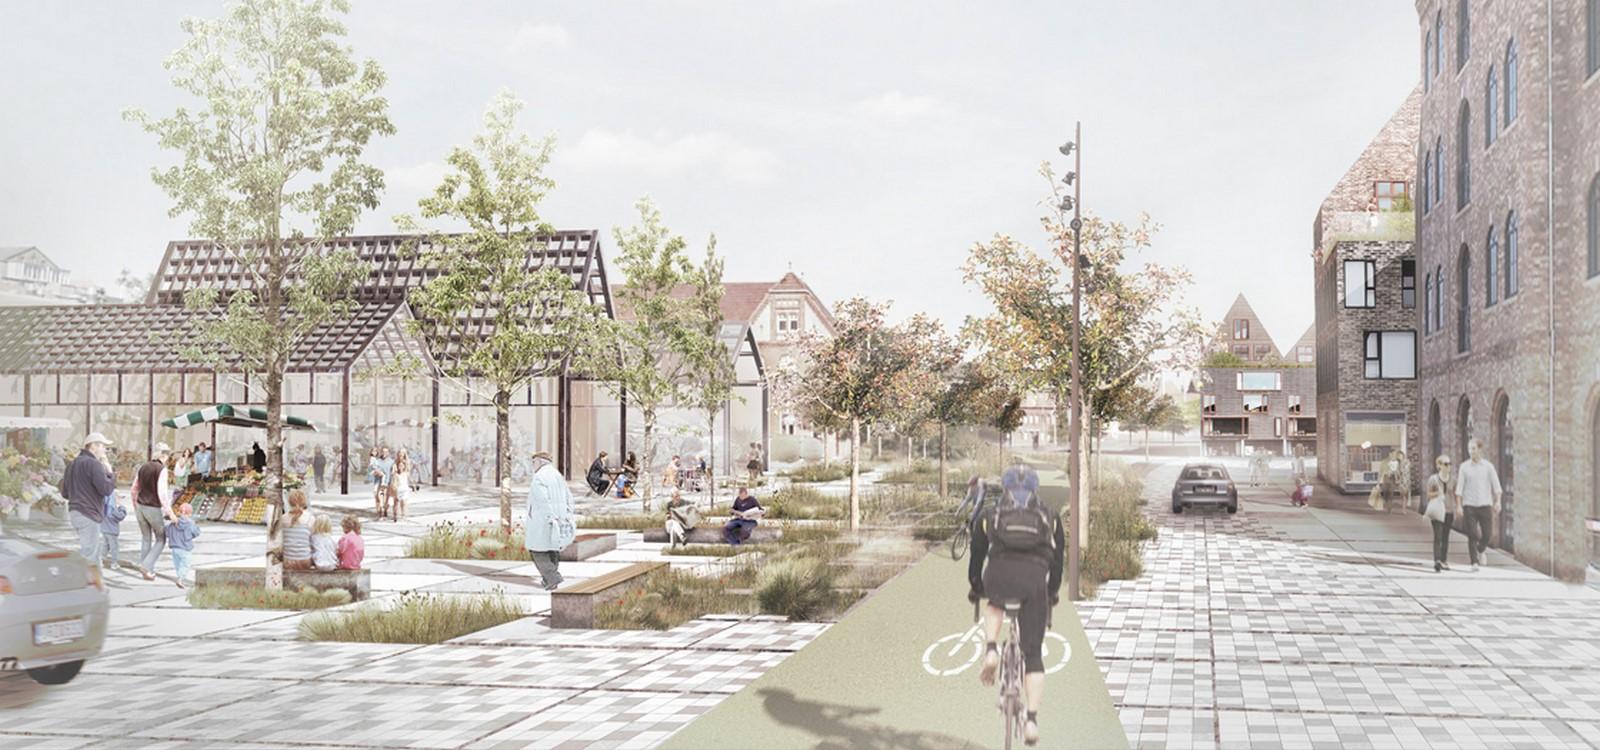 Aabenraa - Market Town of the Futurev - Sheet2